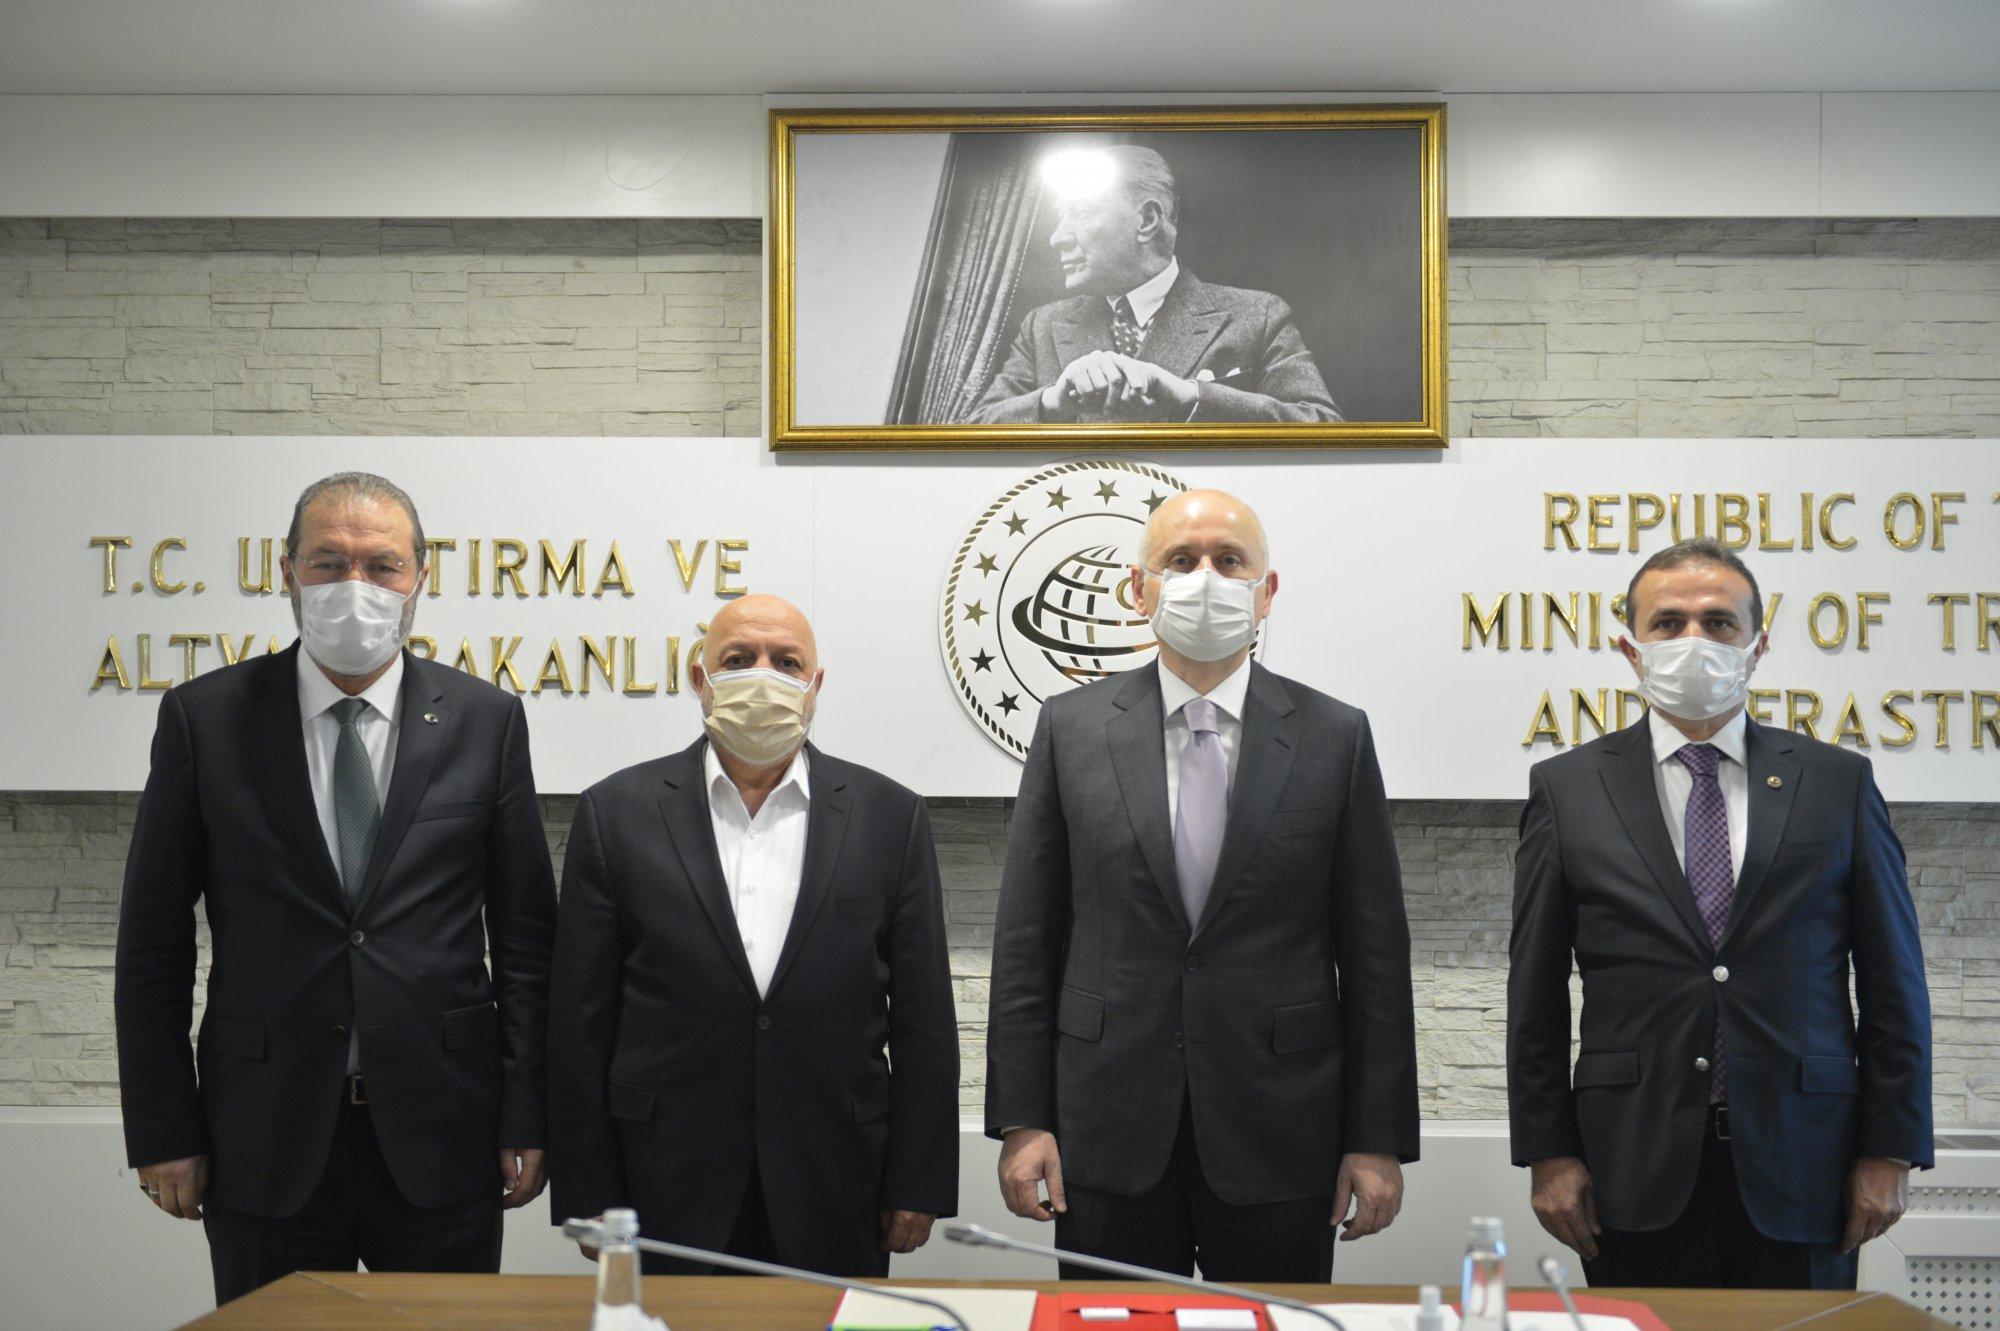 ARSLAN'DAN ULAŞTIRMA BAKANI KARAİSMAİLOĞLU'NA ZİYARET